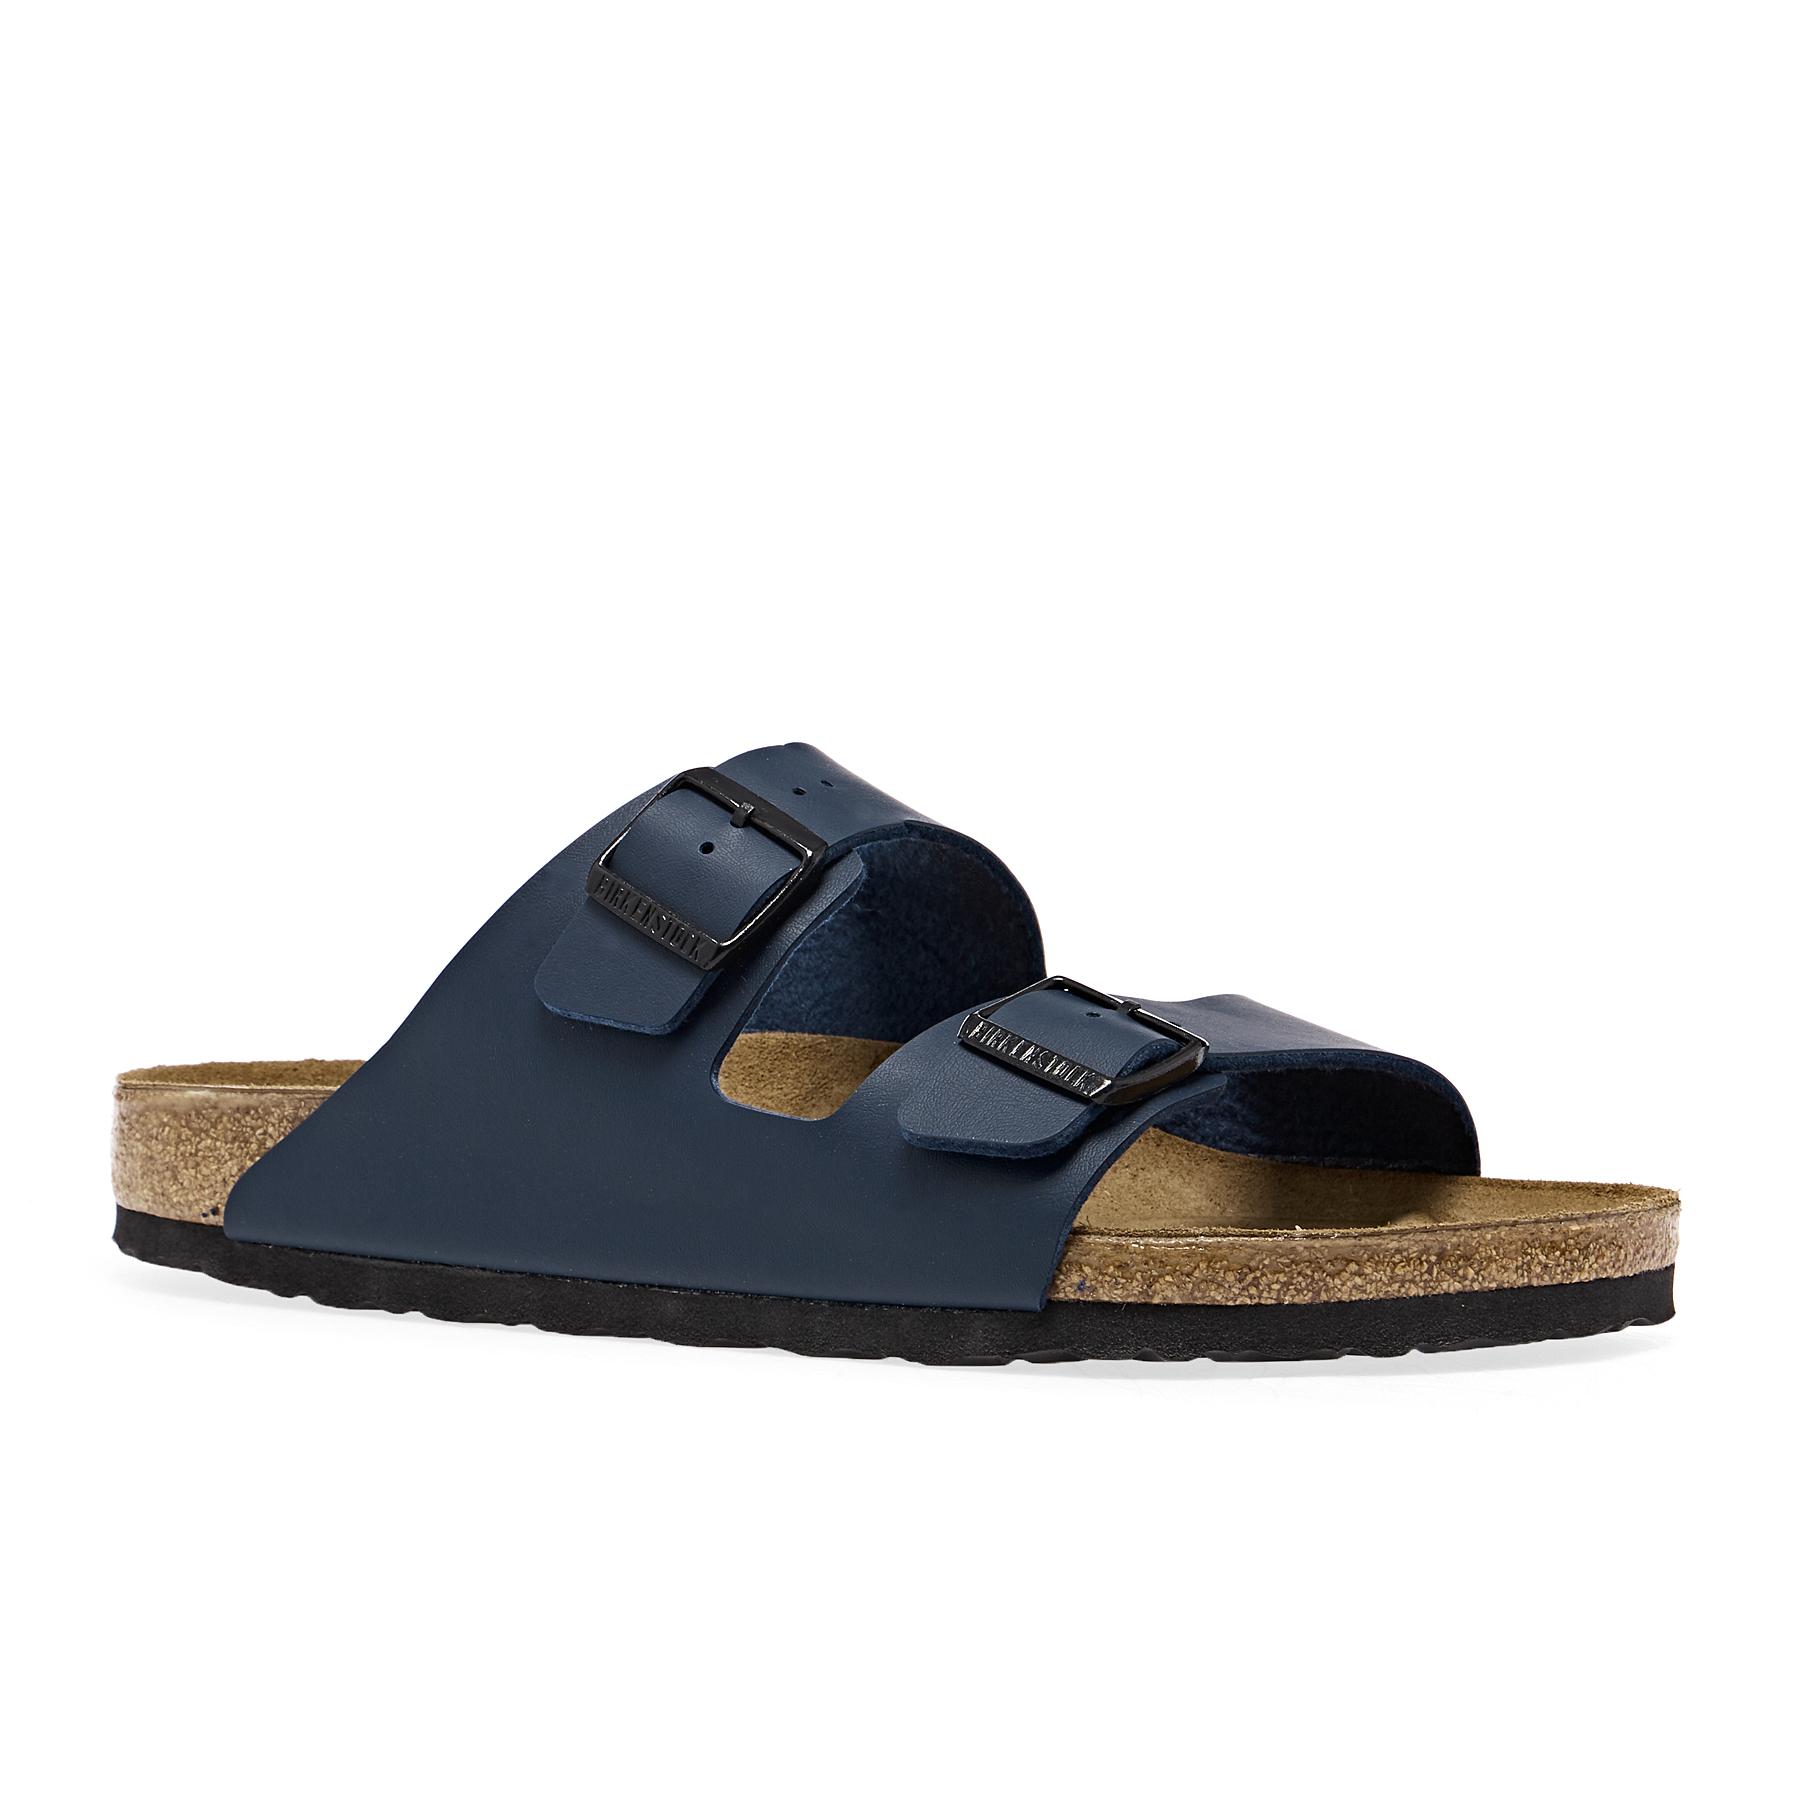 Birkenstock Sandals & Shoes   Womens & Kids Surfdome USA